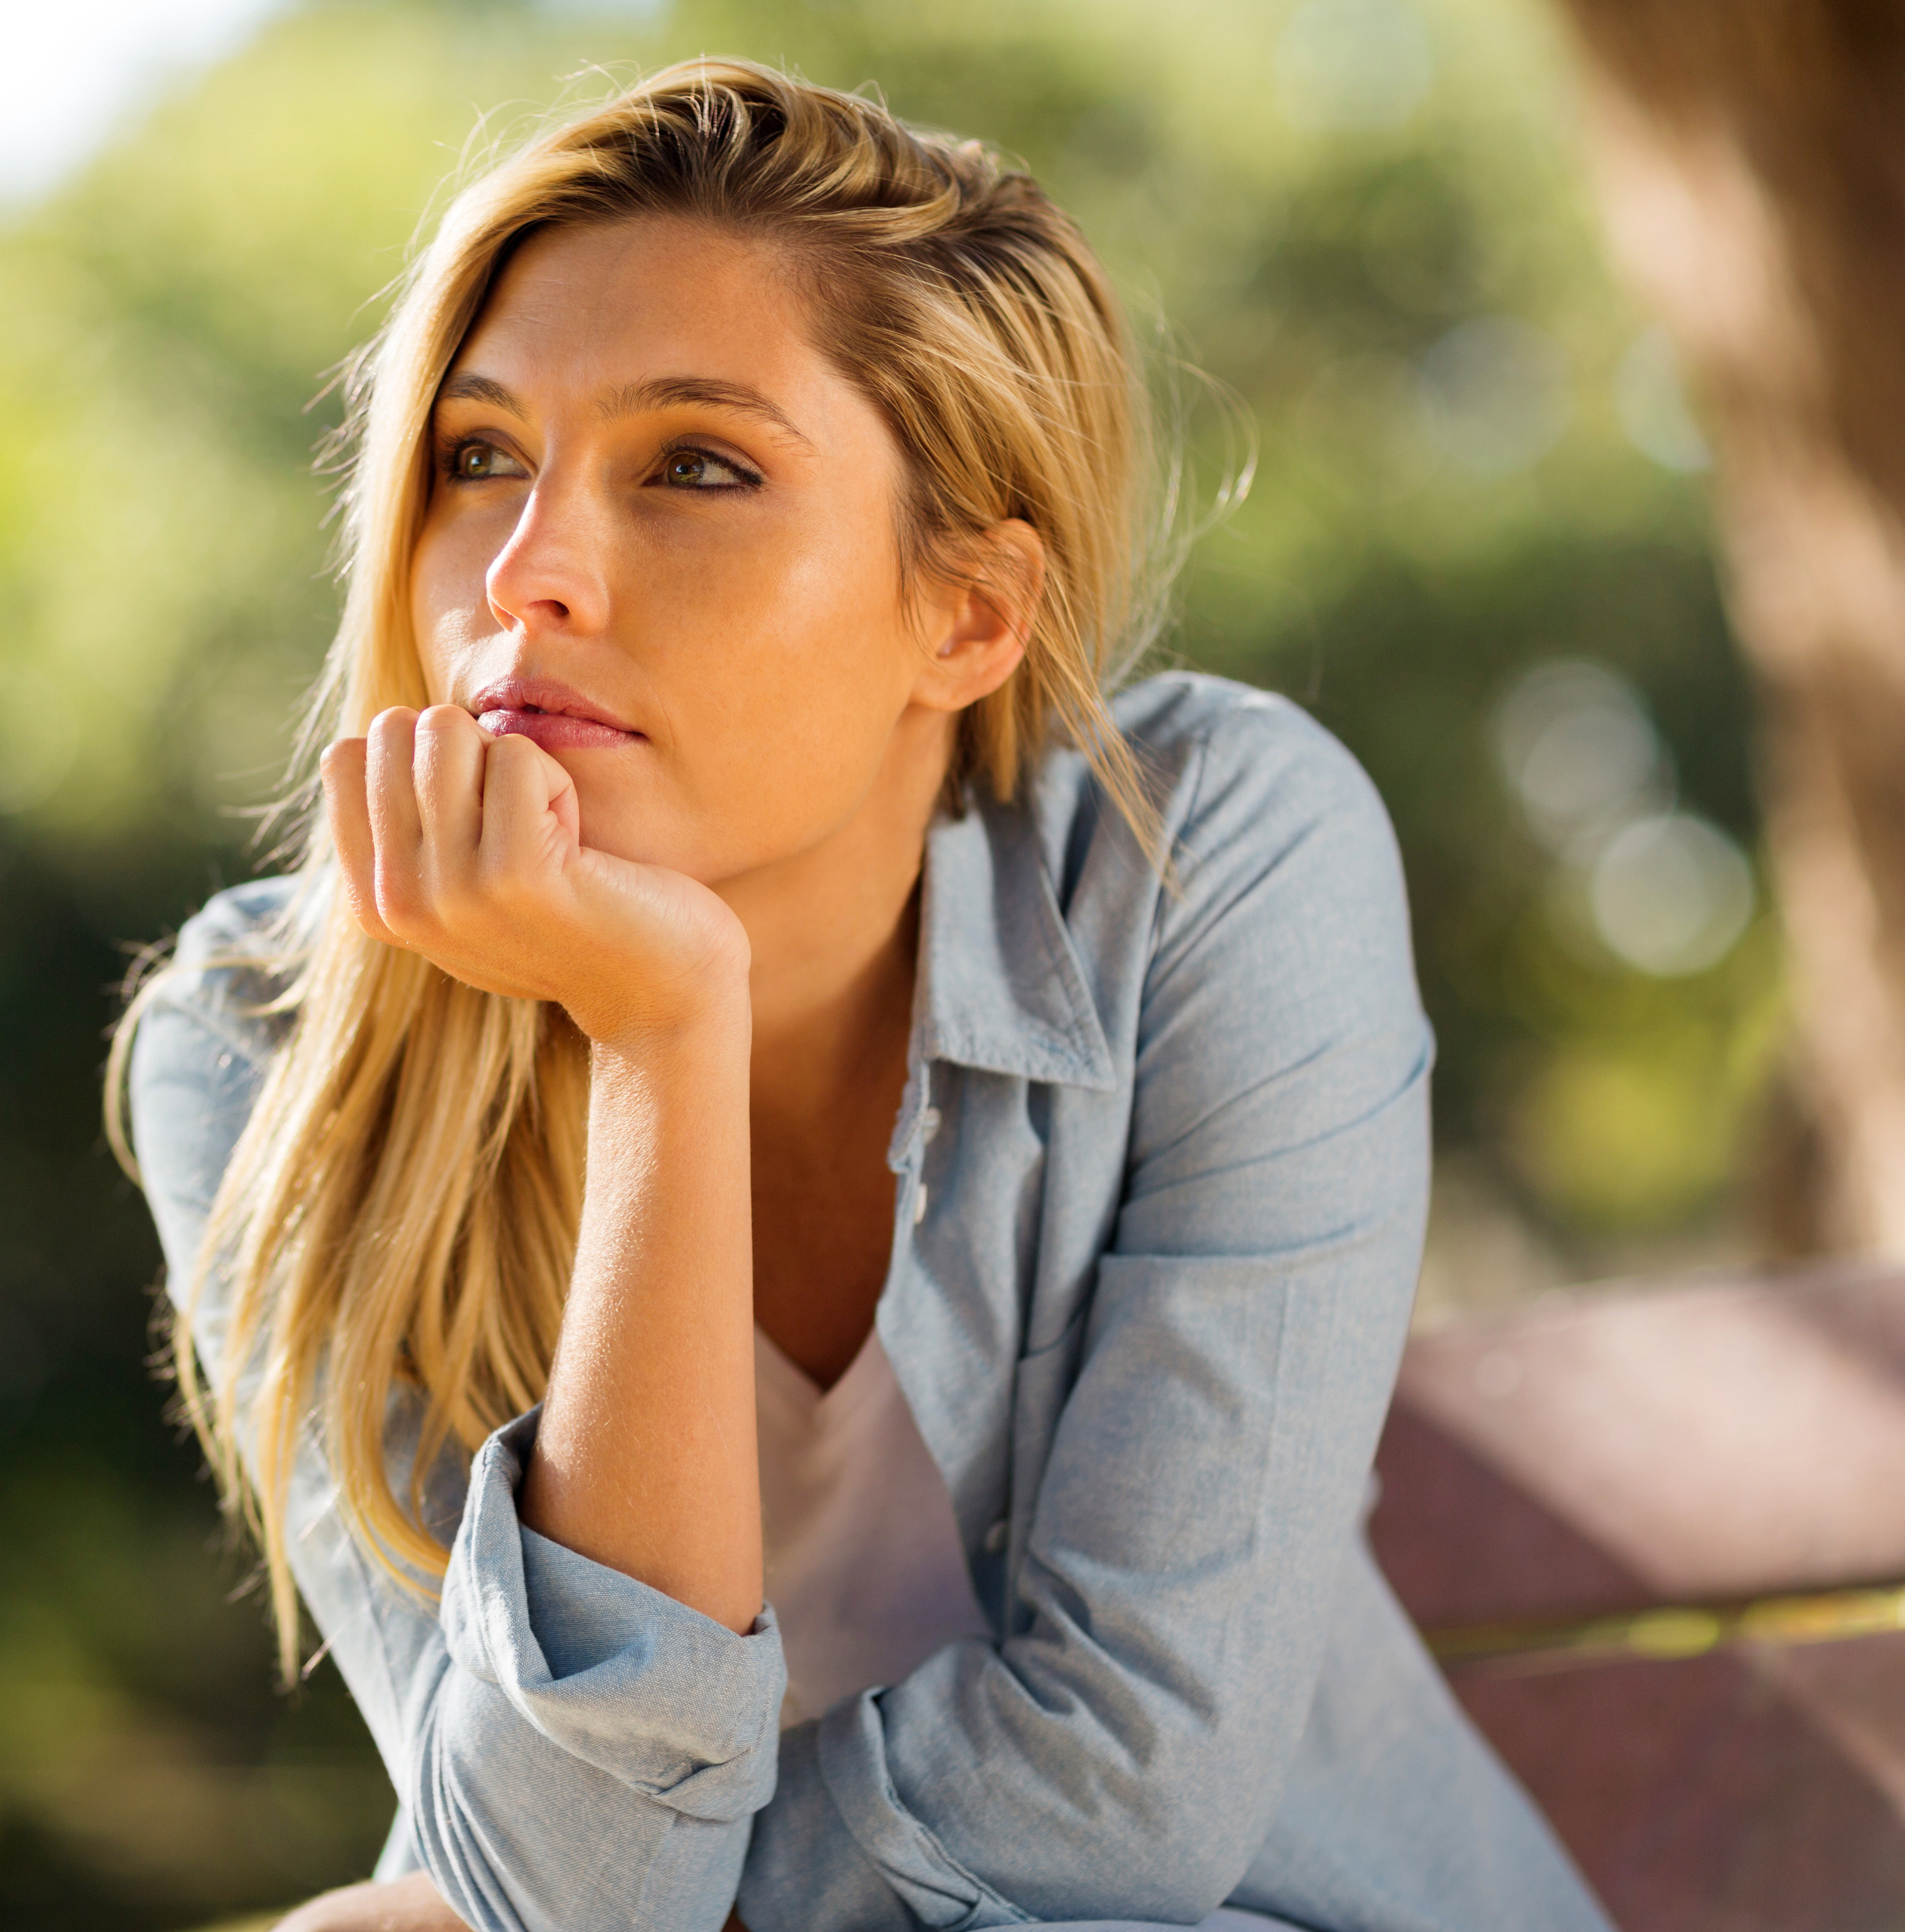 Fertility, Stress, Depression & The Mind Body Connection | Smart Fertility Choices